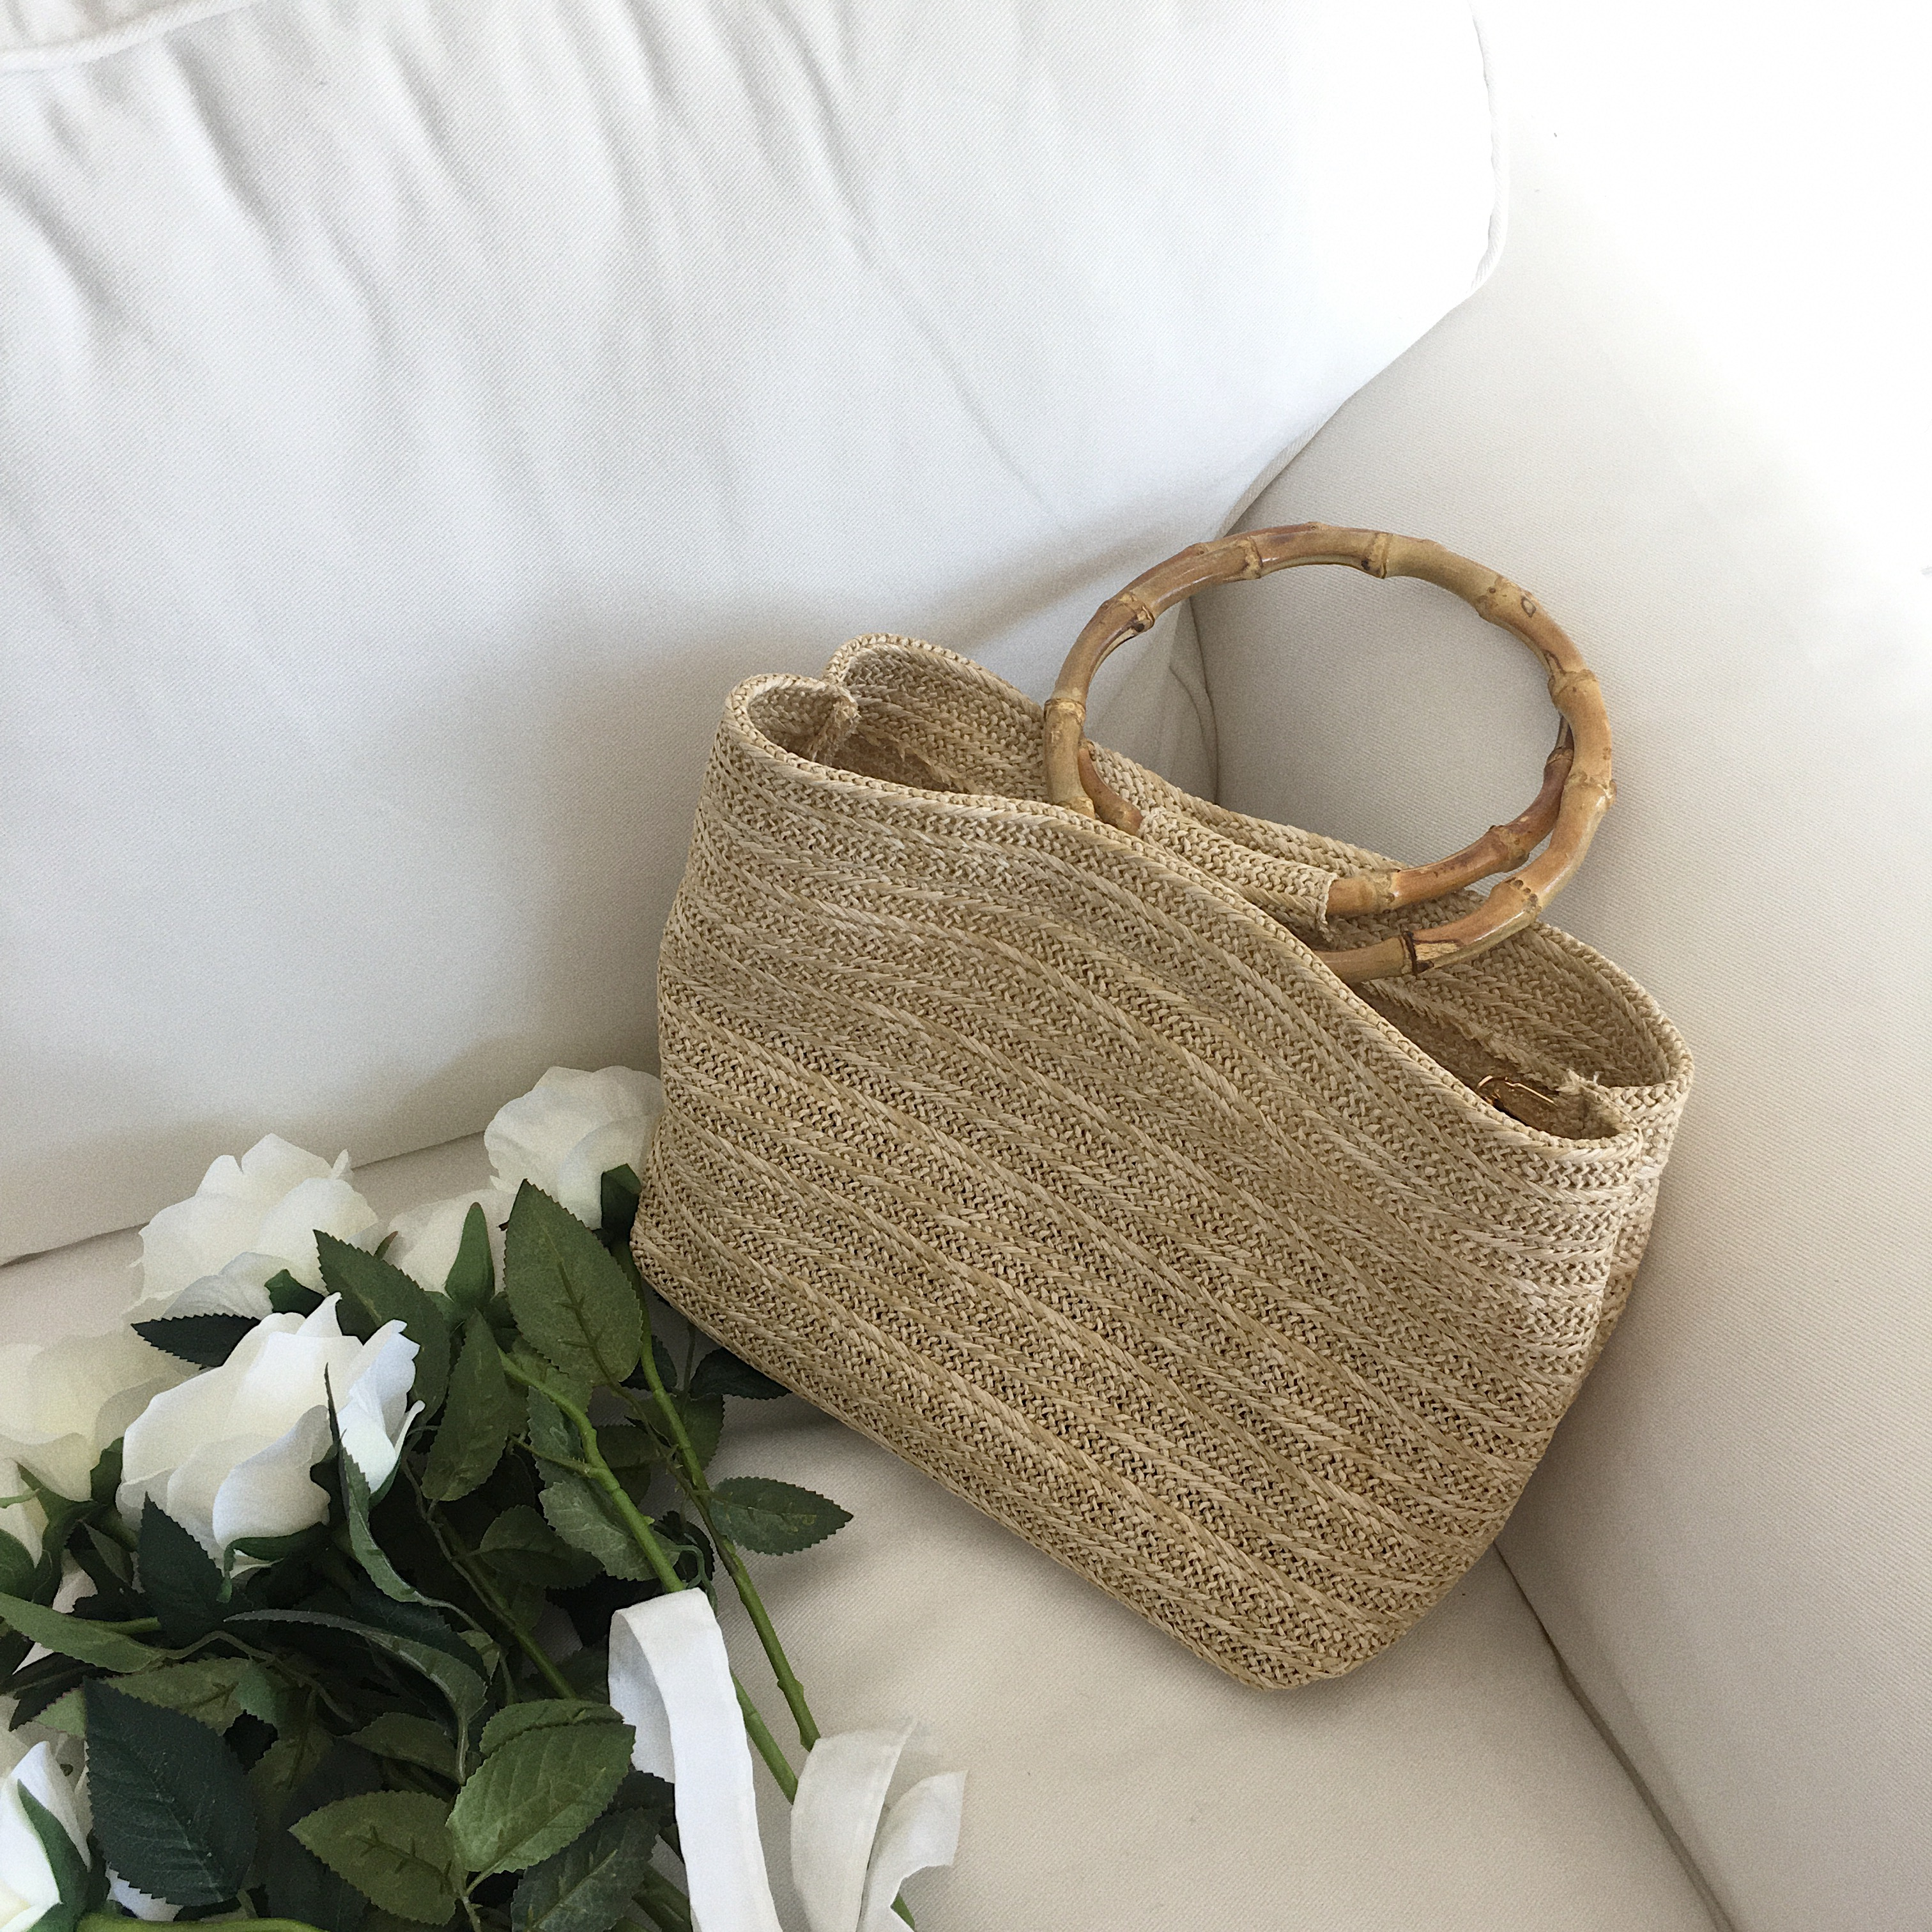 2018 Han Feng cool bamboo knot circular handbag package ins summer new style holiday wind grass weaving bag2018 Han Feng cool bamboo knot circular handbag package ins summer new style holiday wind grass weaving bag